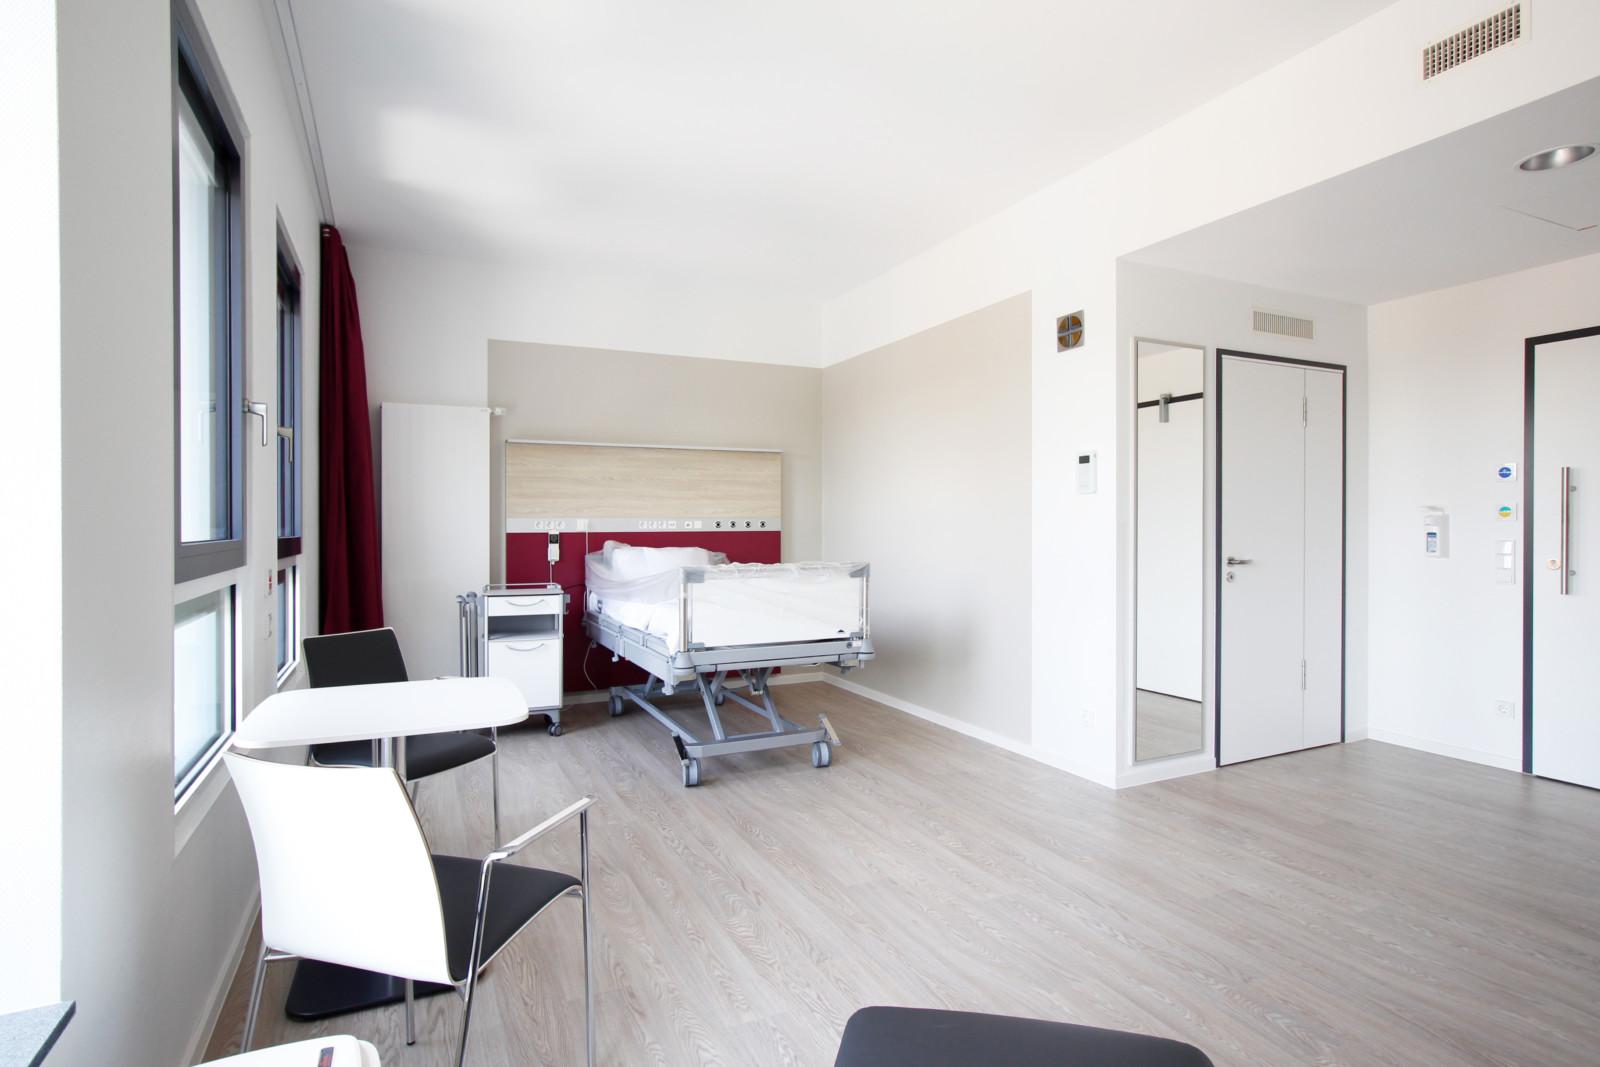 Verbindungsbau_JoHo Dortmund_PKV-Zimmer 2